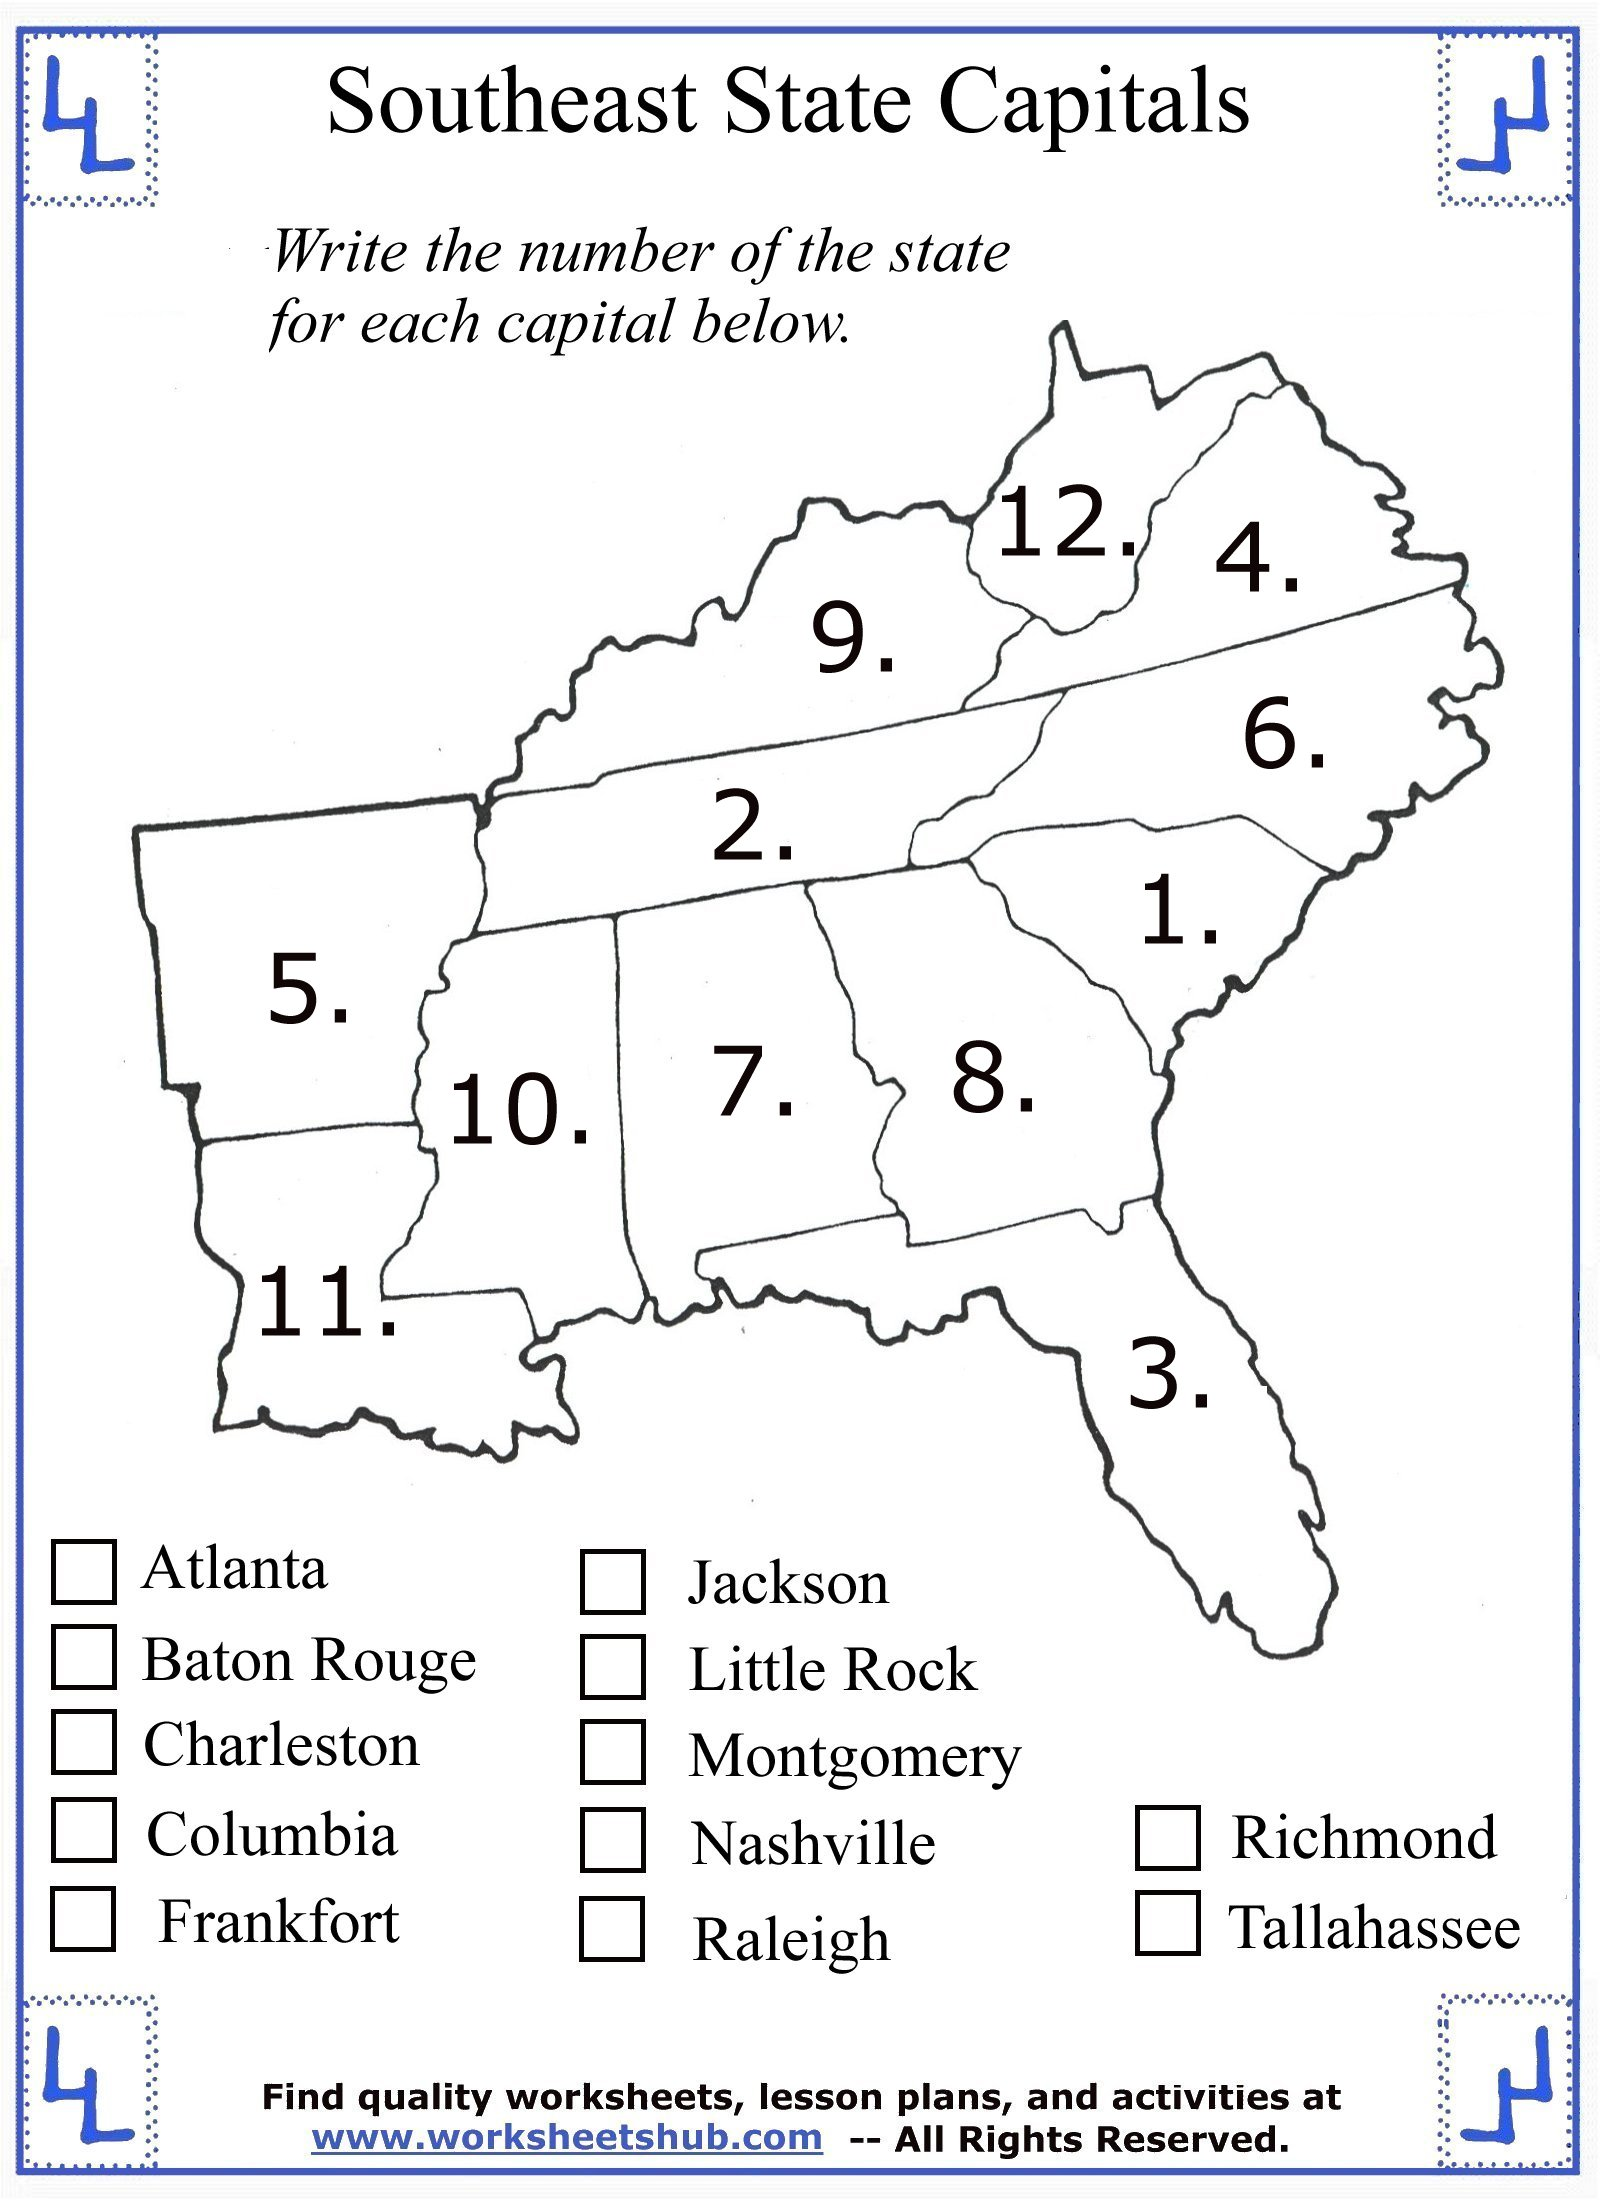 4th Grade Social Studies - Southeast Region States